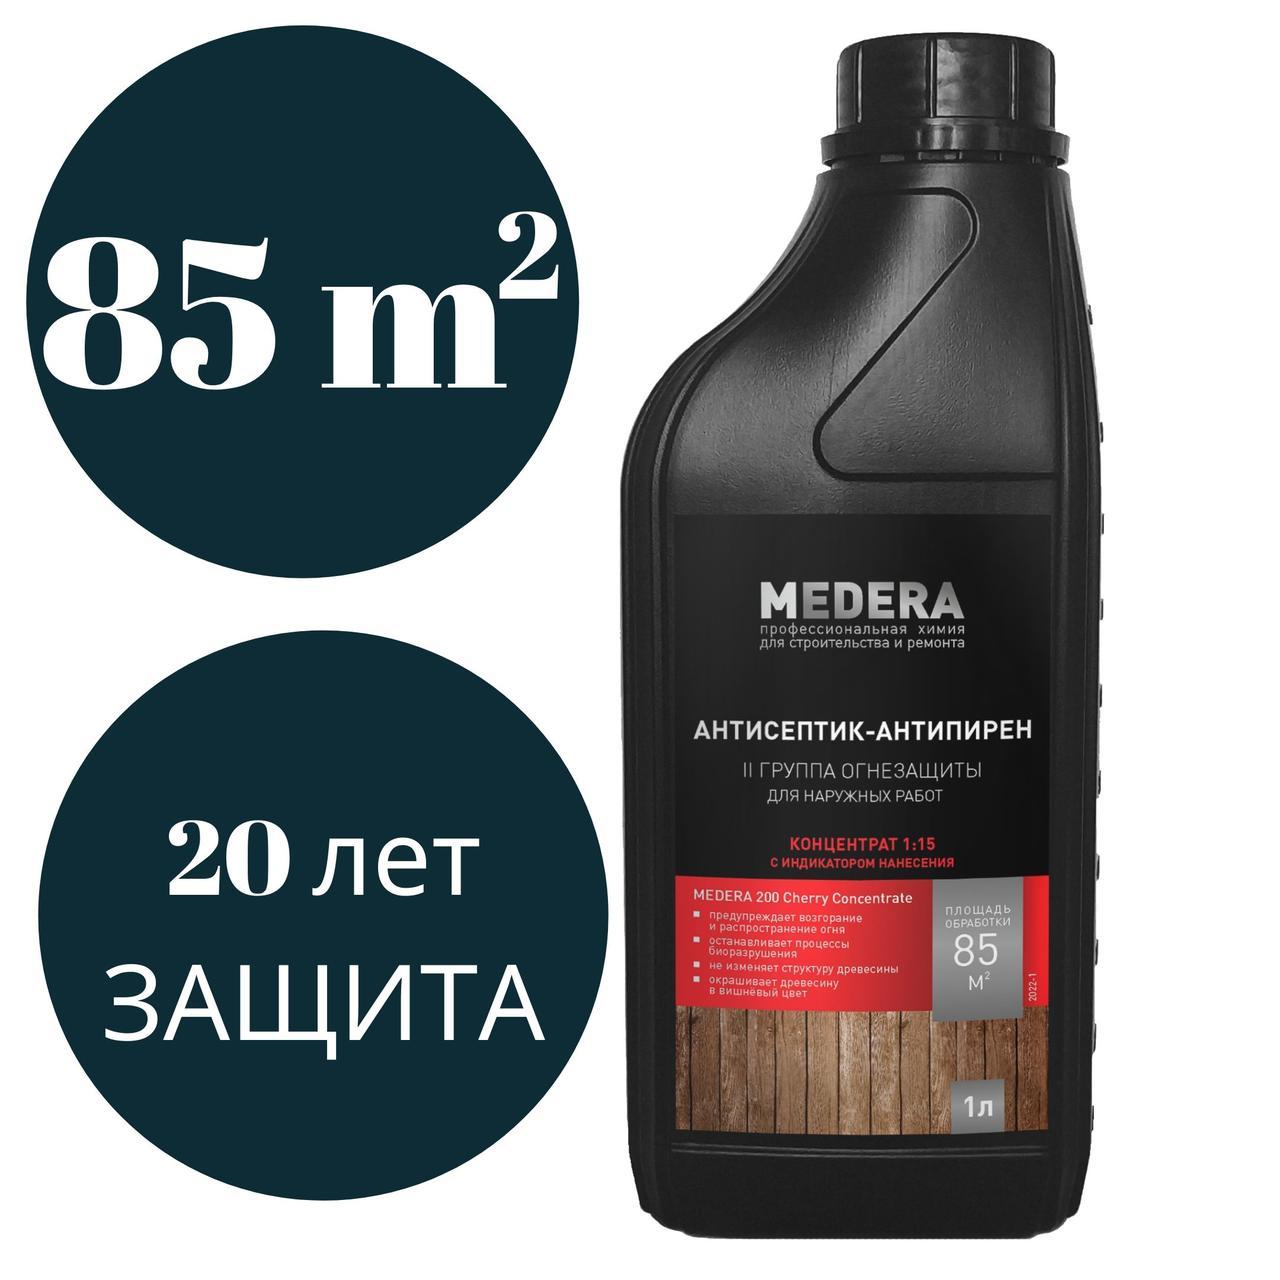 Огнебиозащита пропитка для древесины  II гр. 2022-1 MEDERA 200 - Cherry Concentrate 1:15  1 л. (85 м2)